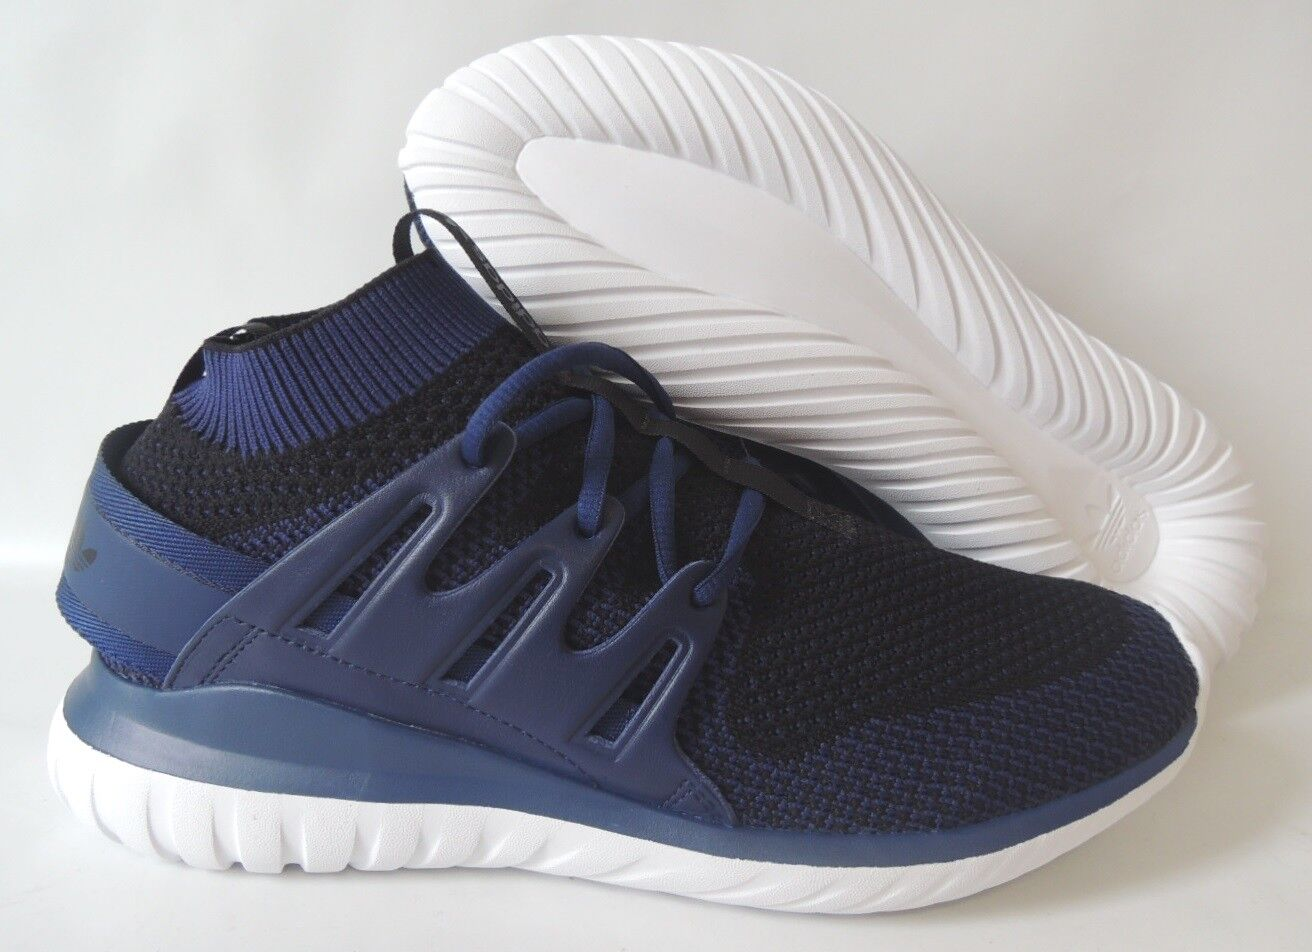 NEU adidas Tubular Nova PK Größe 43 1/3 Sneaker Schuhe S80108 ORIGINALS